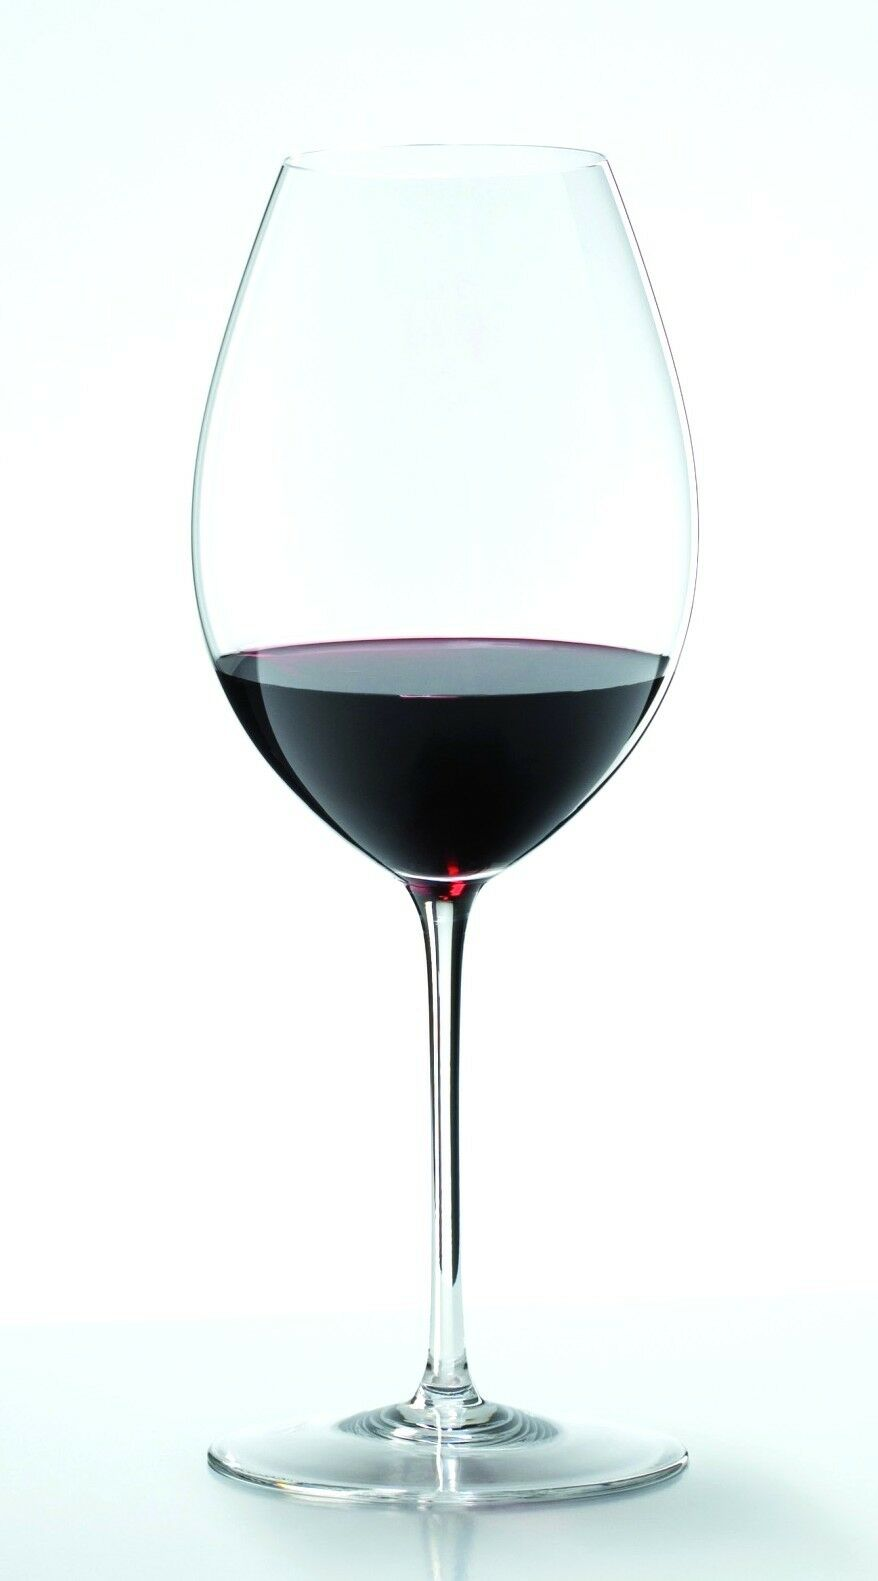 1 riedel sommeliers tinto Riserva, 4400 31, rojoweinglas